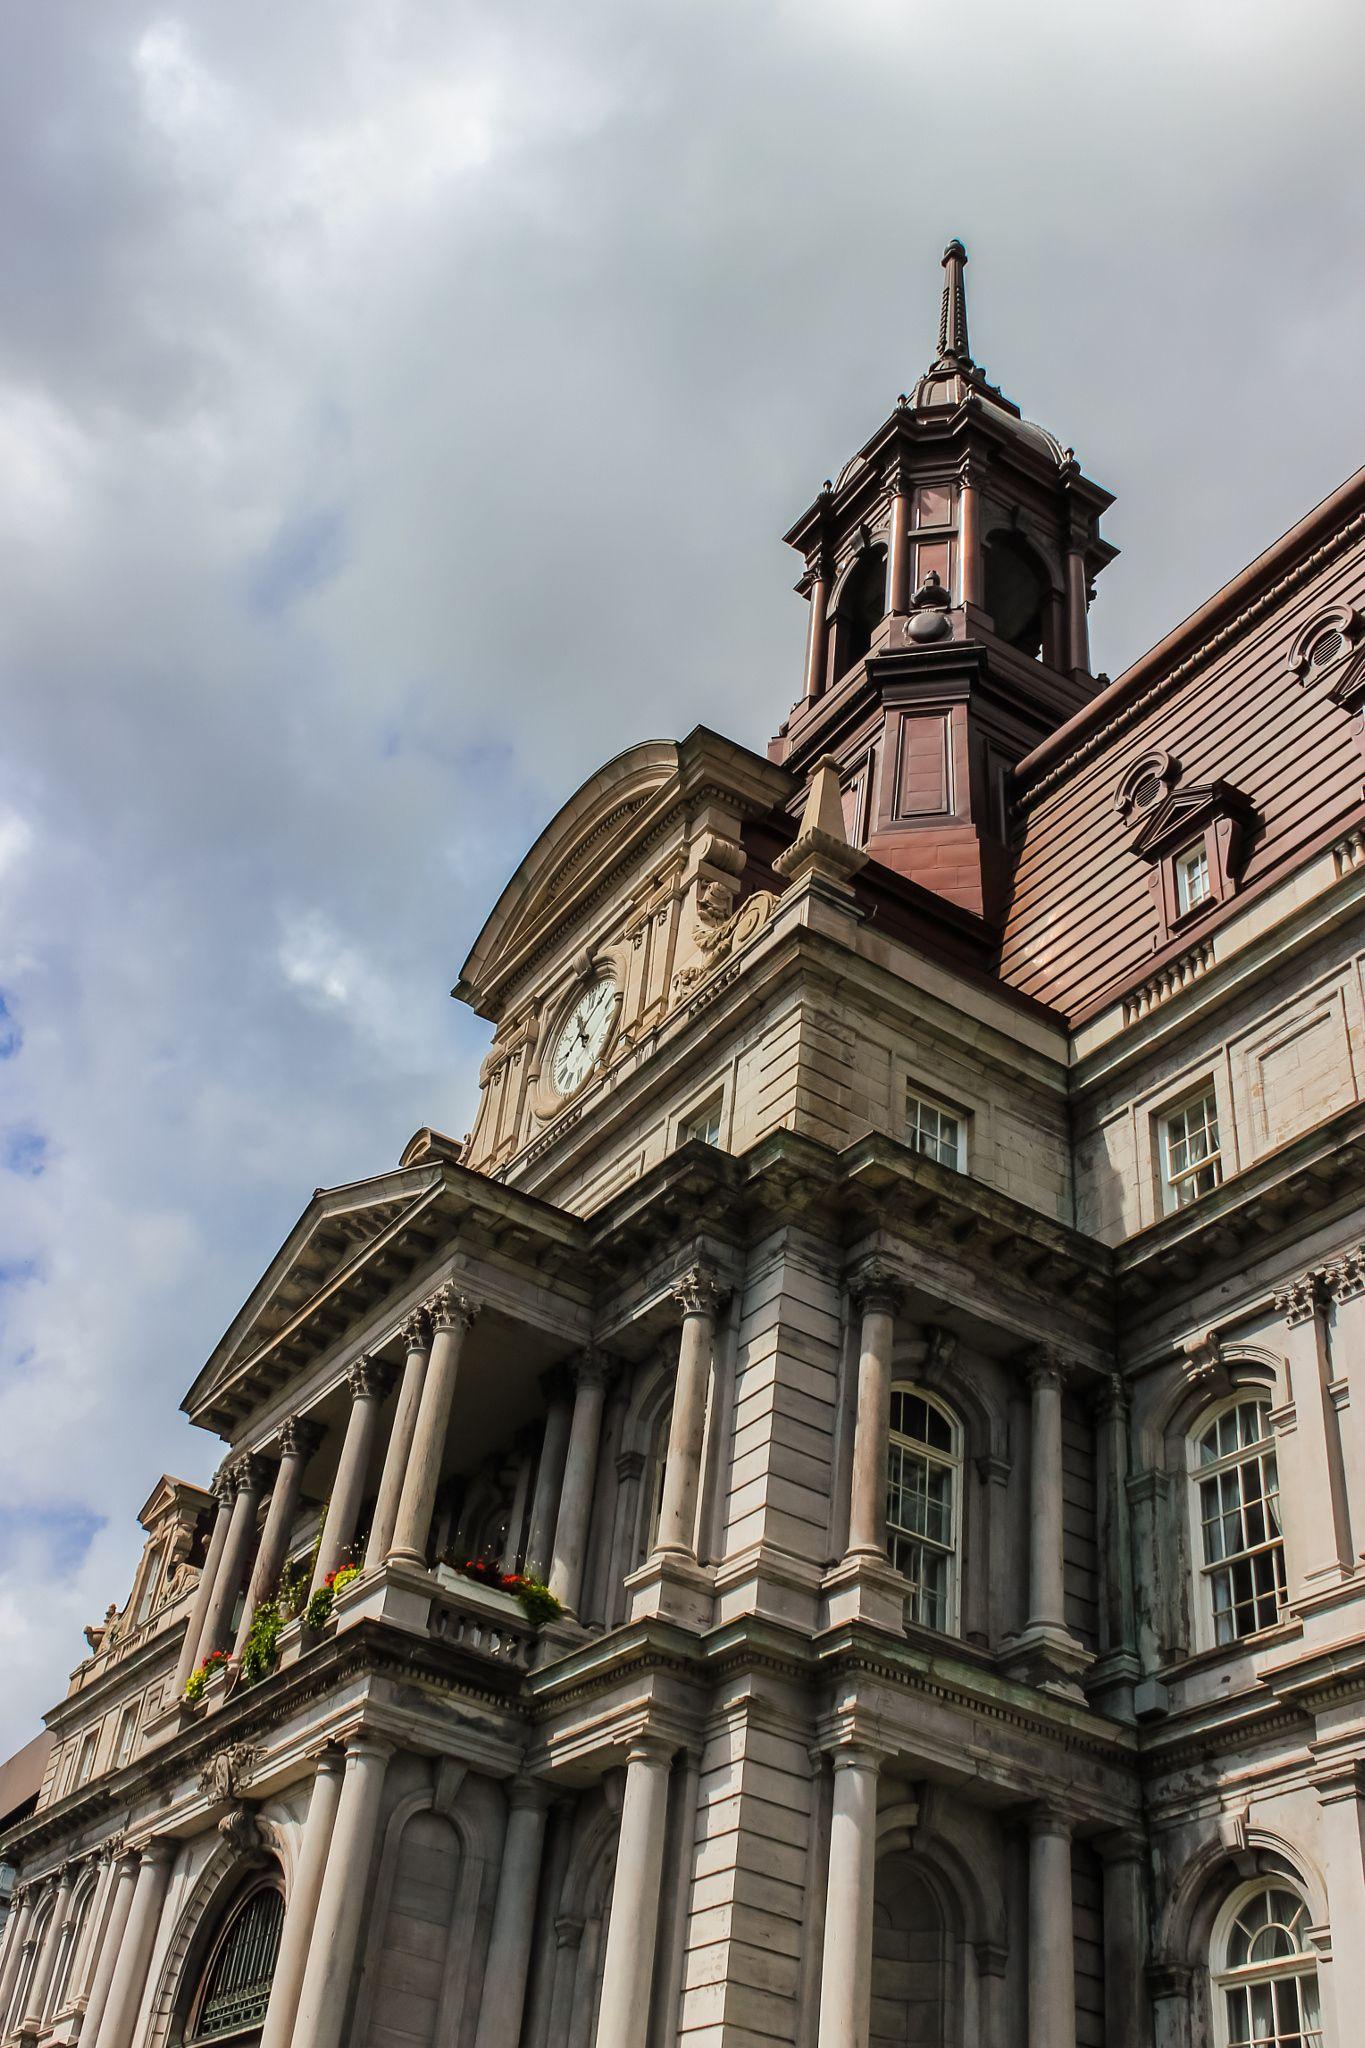 City hall montreal quebec canada